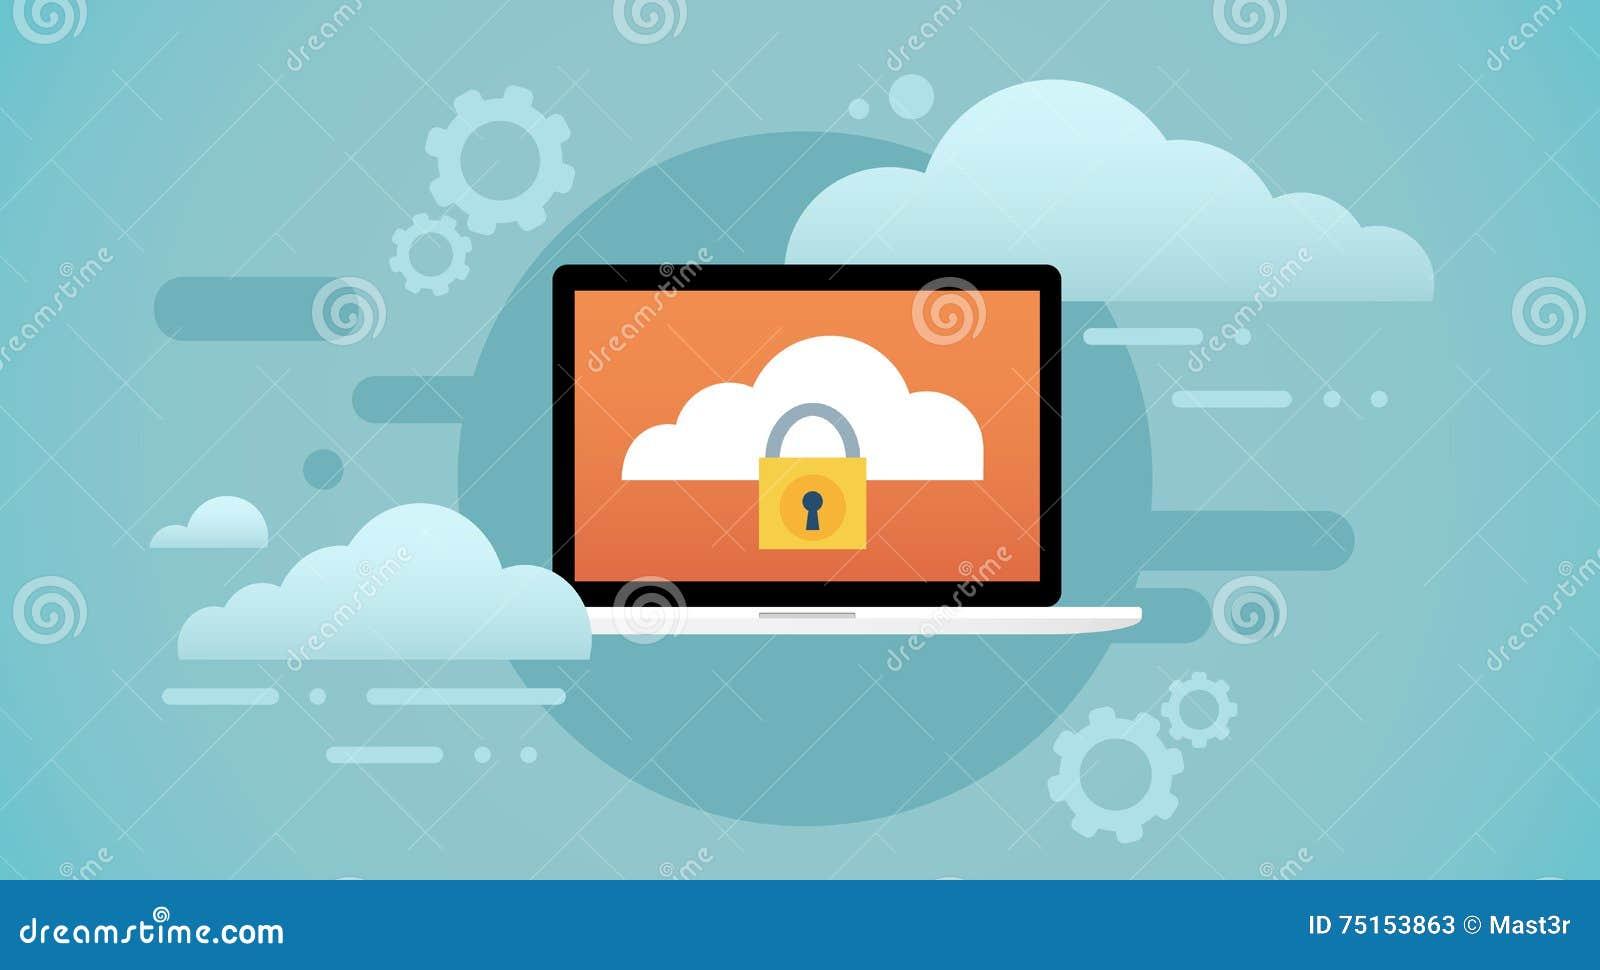 Laptop-Computer Wolken-Datenbank-Verschluss-Schirm-Daten-Schutz der Privatsphäre